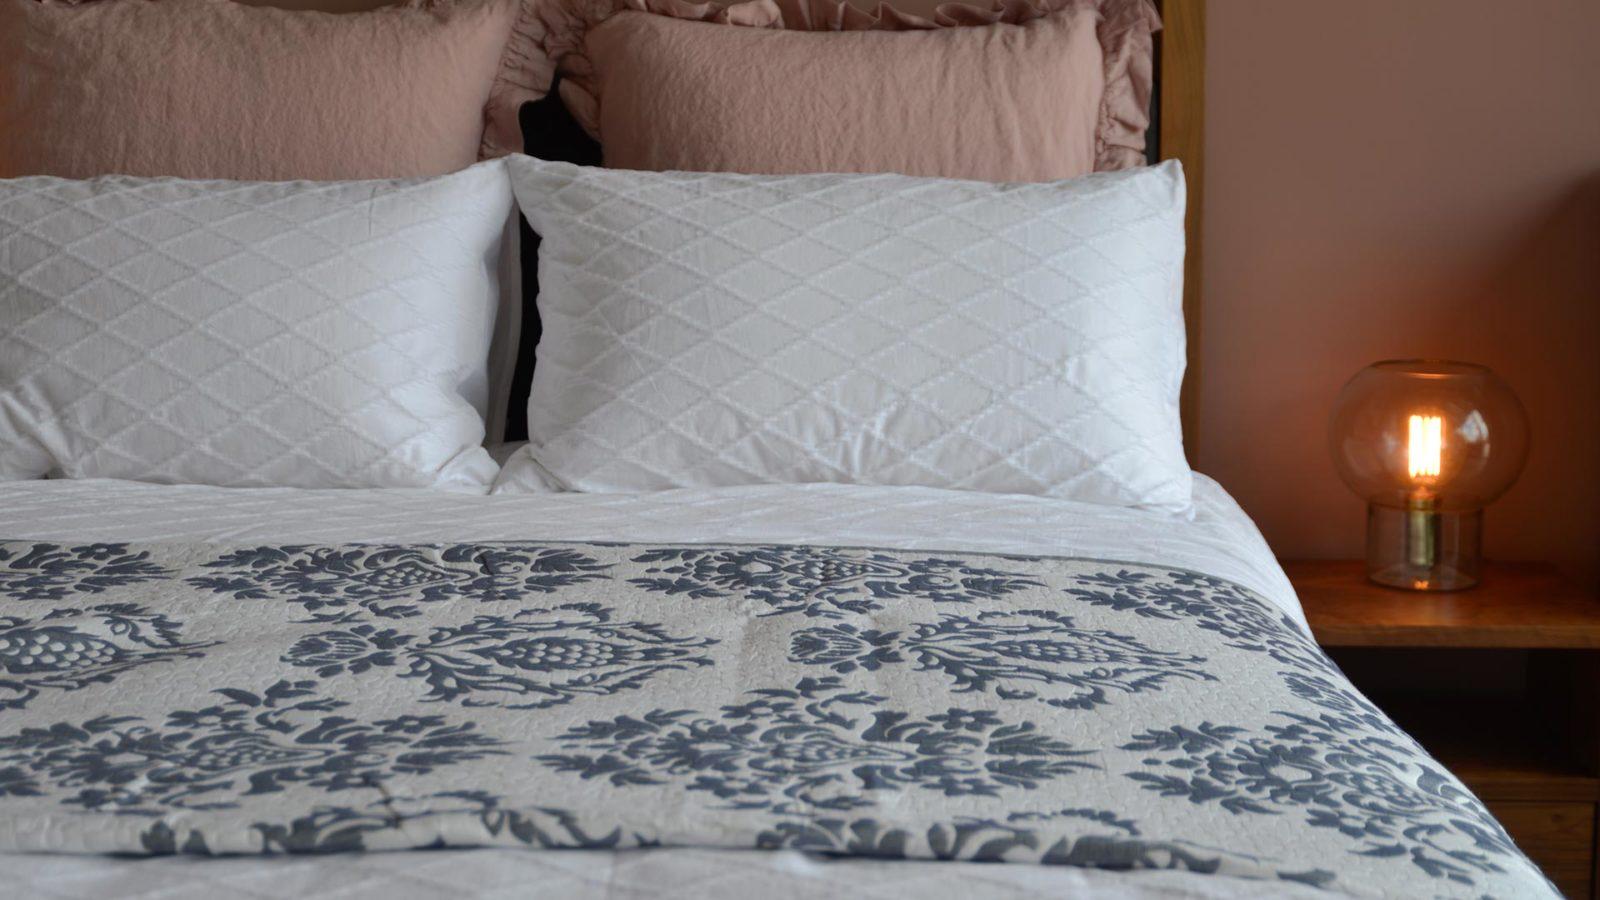 jacquard-bedspread